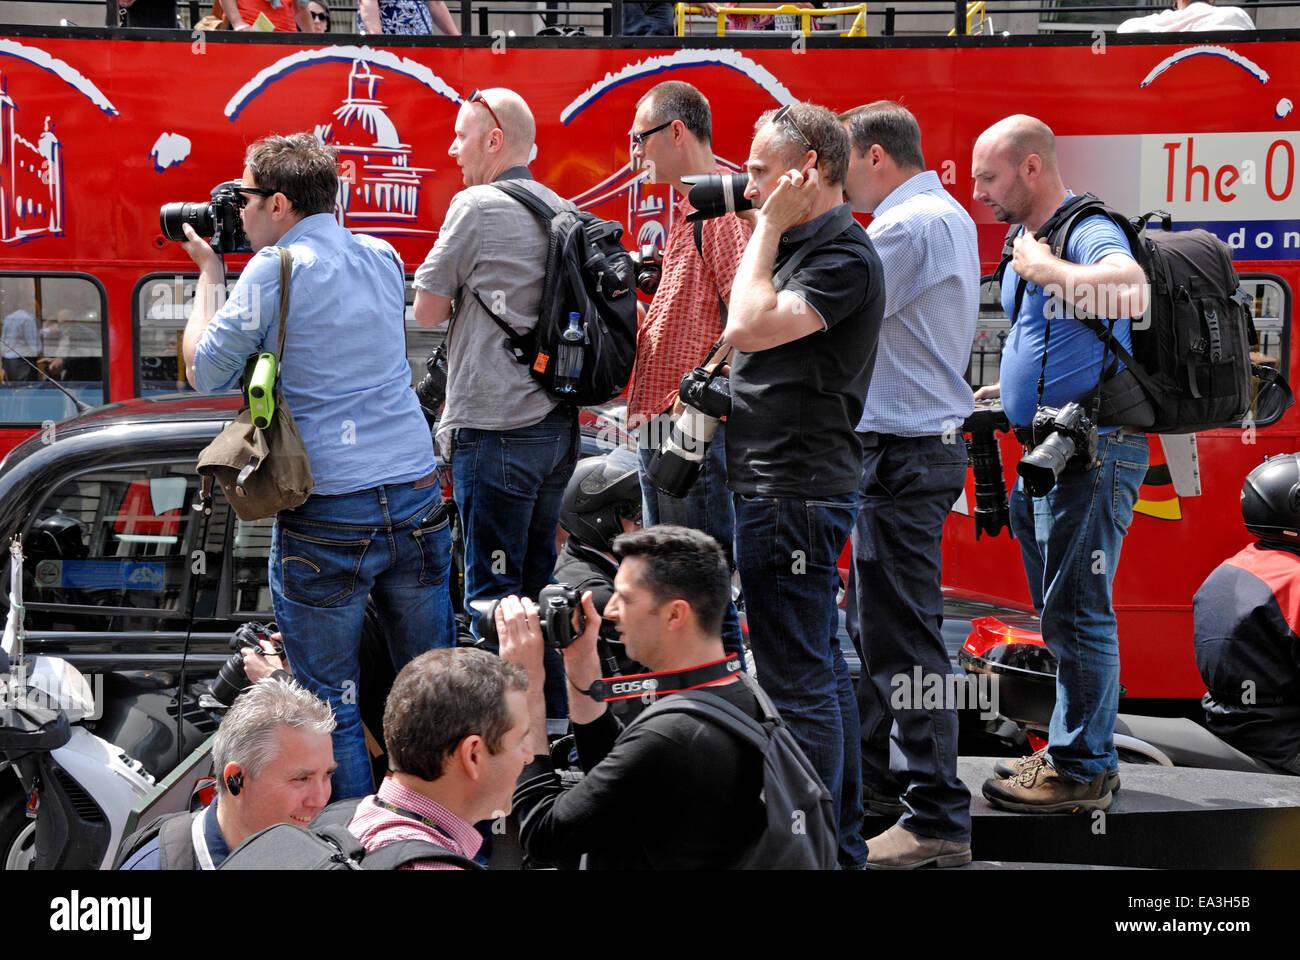 London, England, UK. Photographers covering the London Black cab drivers blockade Trafalgar Square 2014 Stock Photo